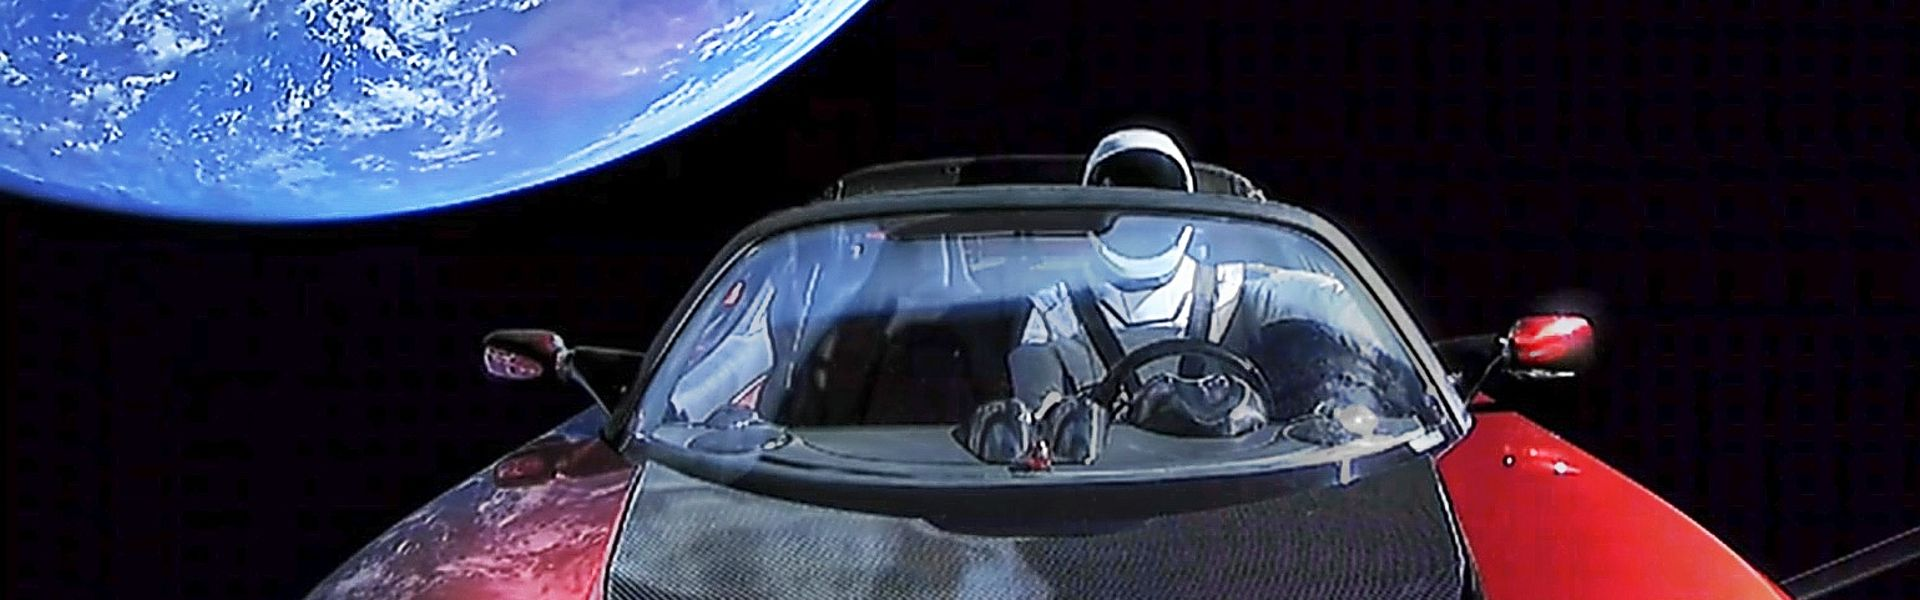 Starman on the way bij de column 'CV-ketels en eco-freaks-ketels en eco-freaks' van Paul Schrijft